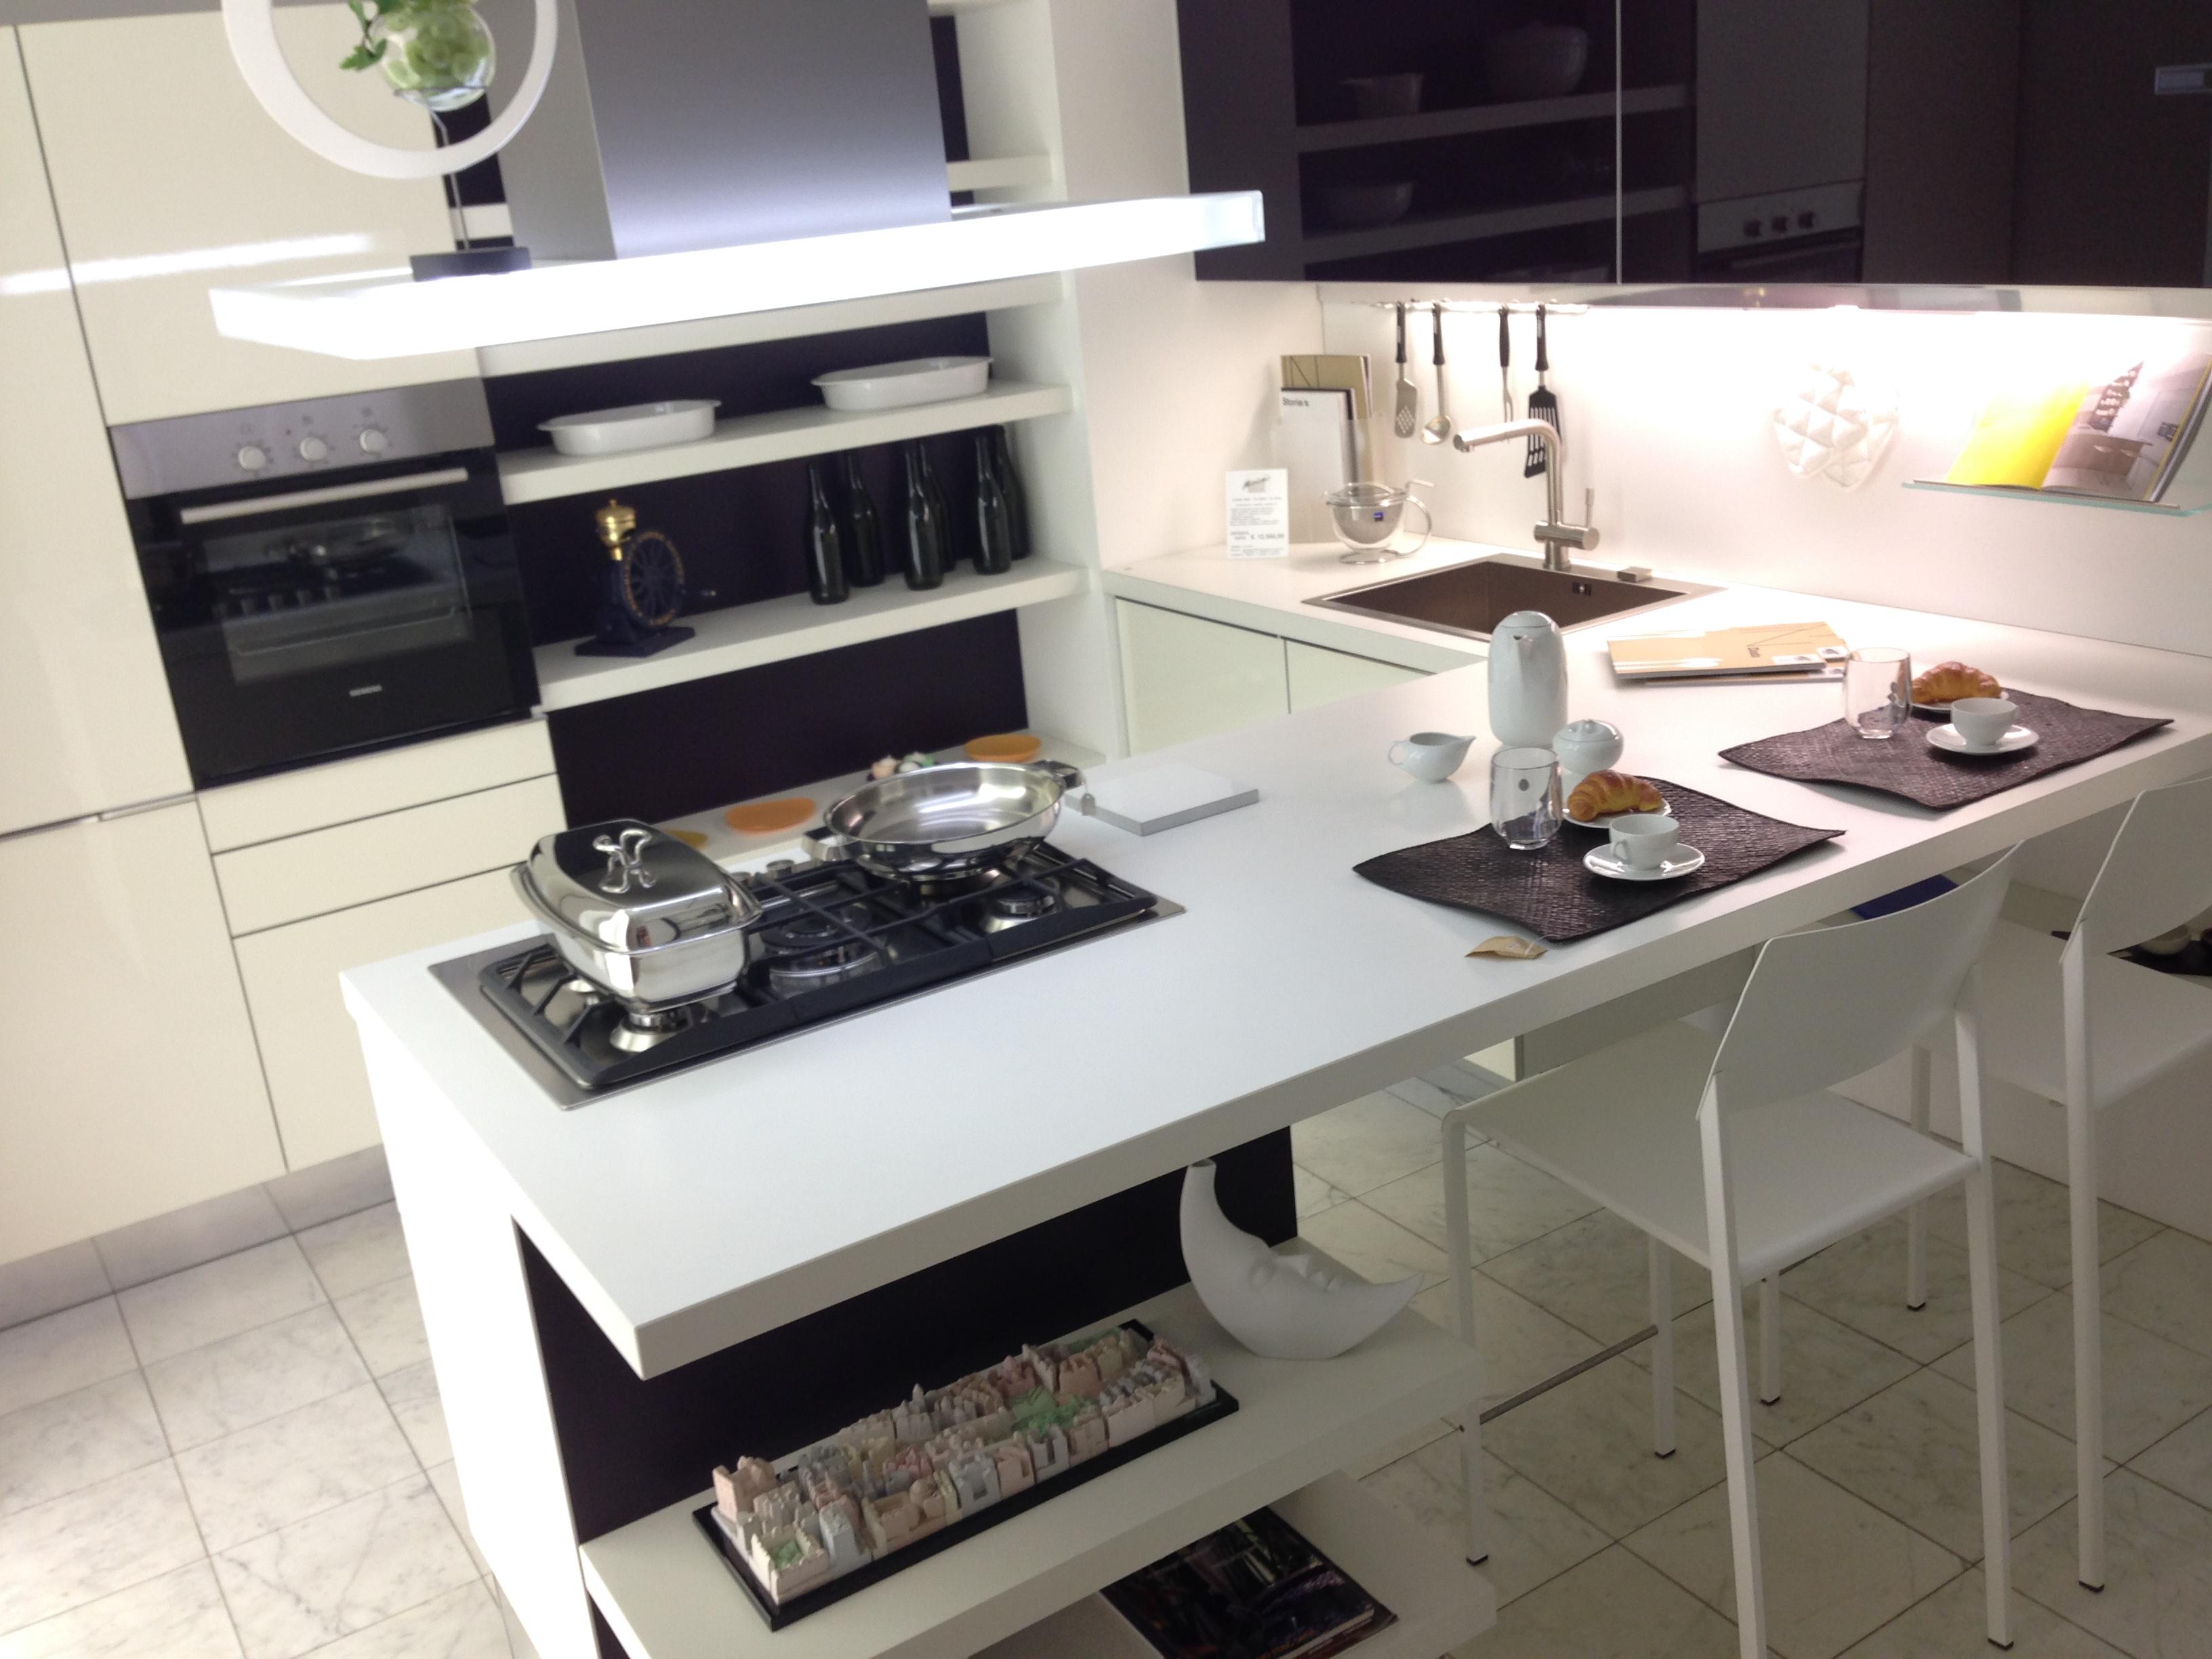 Misure Mobili Cucina Ad Angolo. Simple Ovviam With Misure Mobili ...